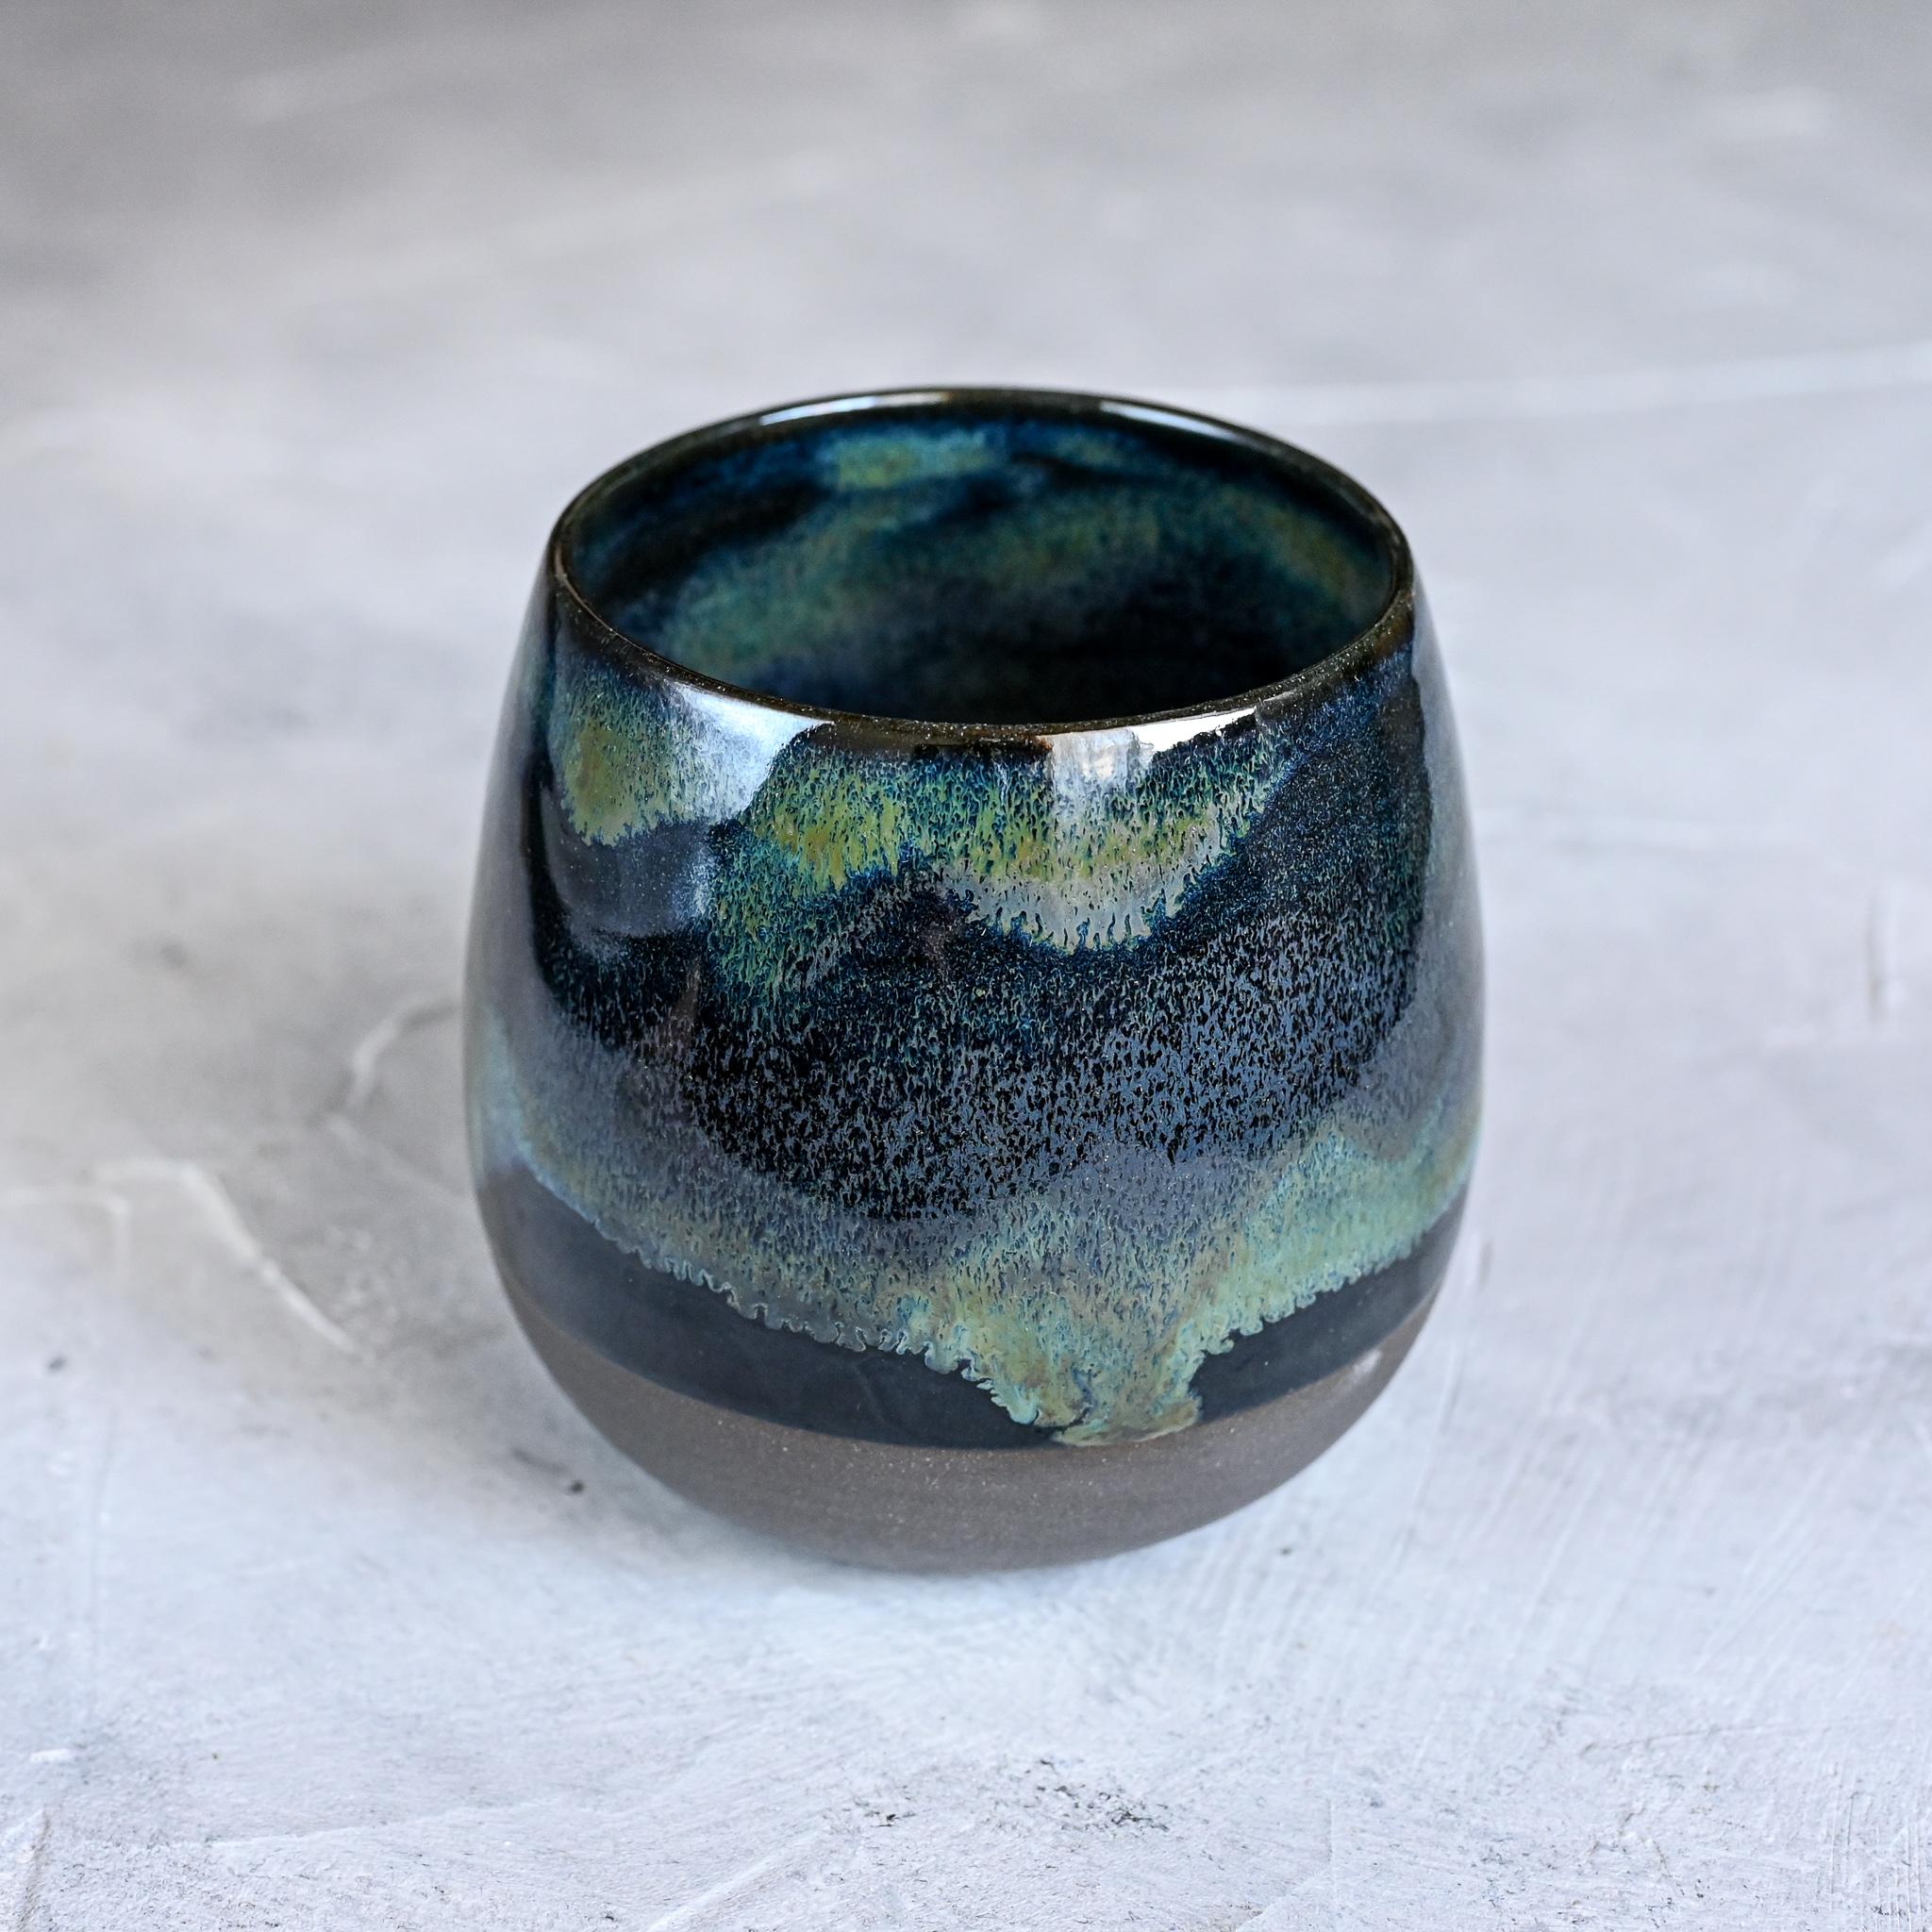 картинка Керамический стакан Марии Левиной 26 - DishWishes.Ru